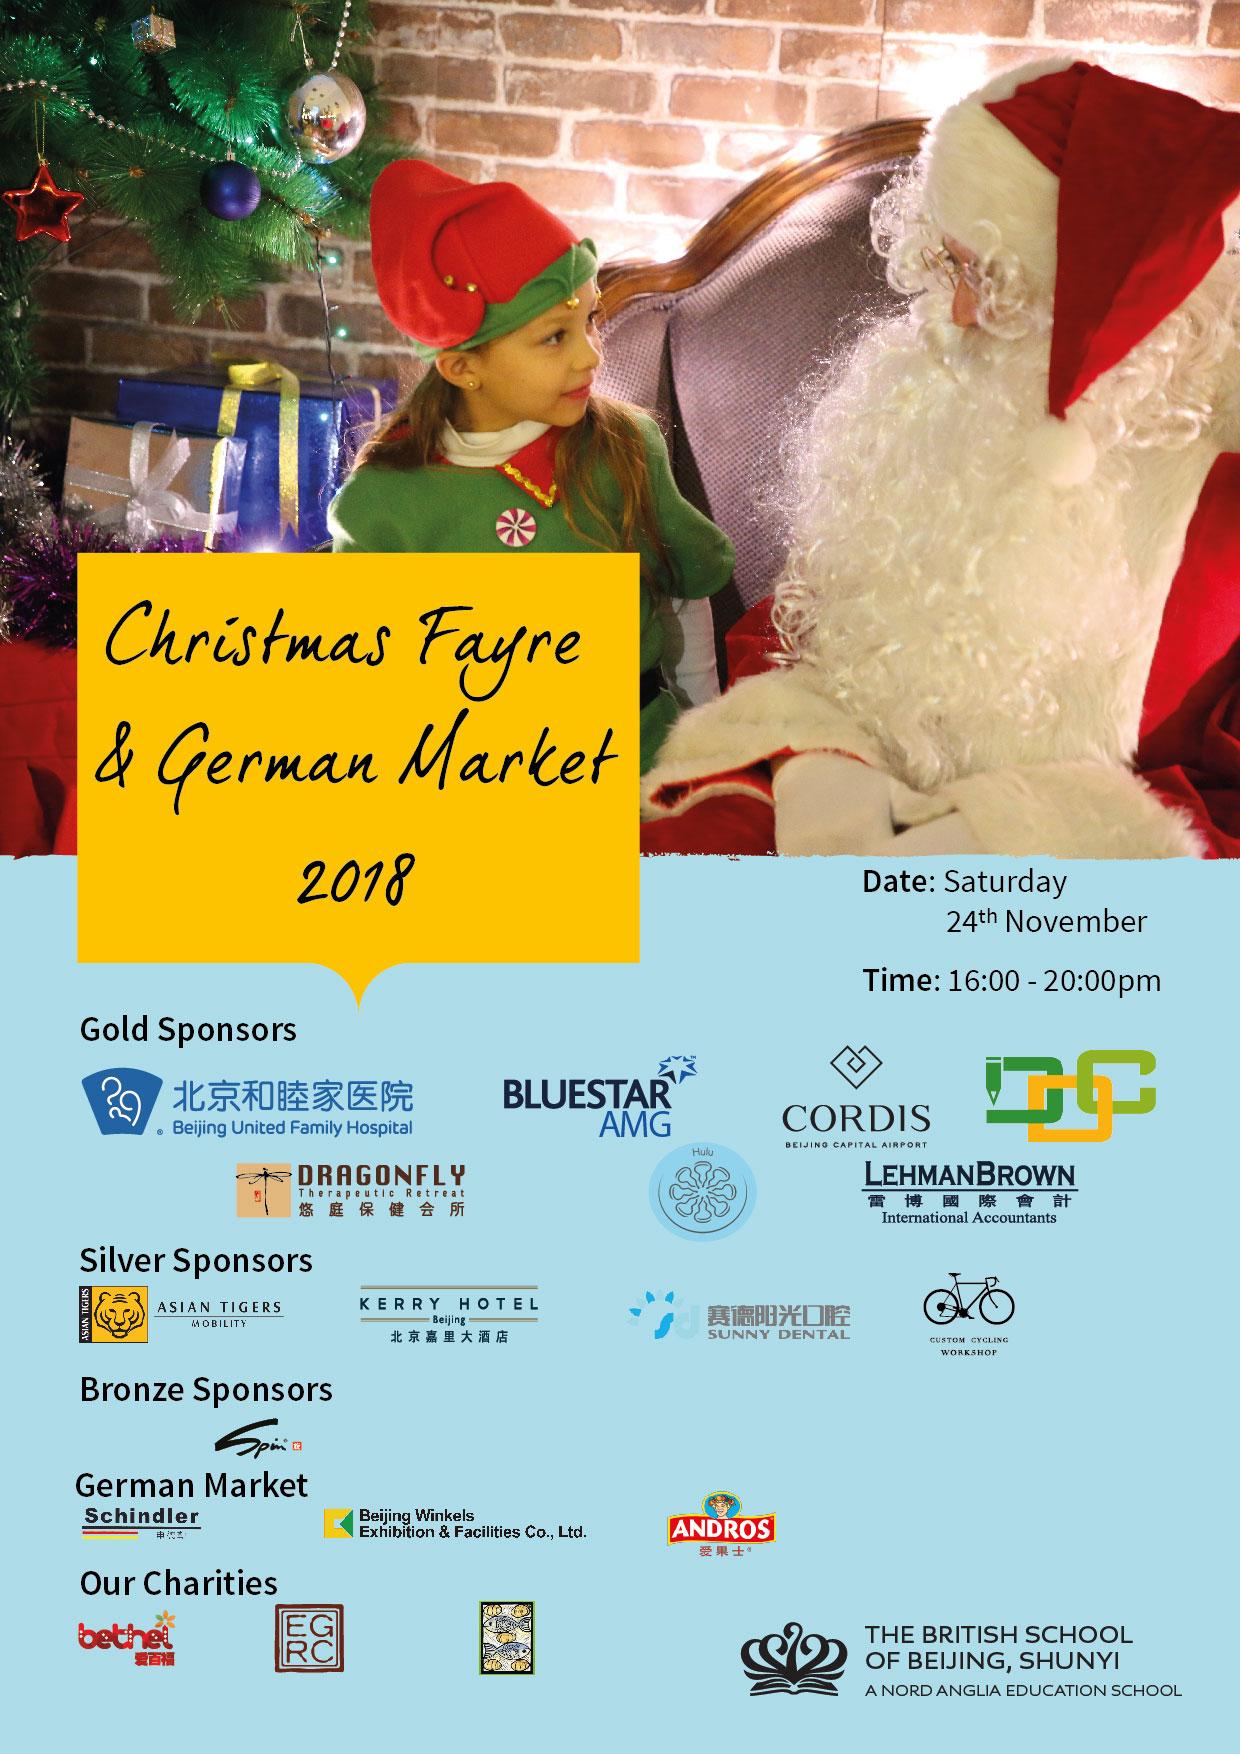 BSB Shunyi Christmas Fayre & German Market